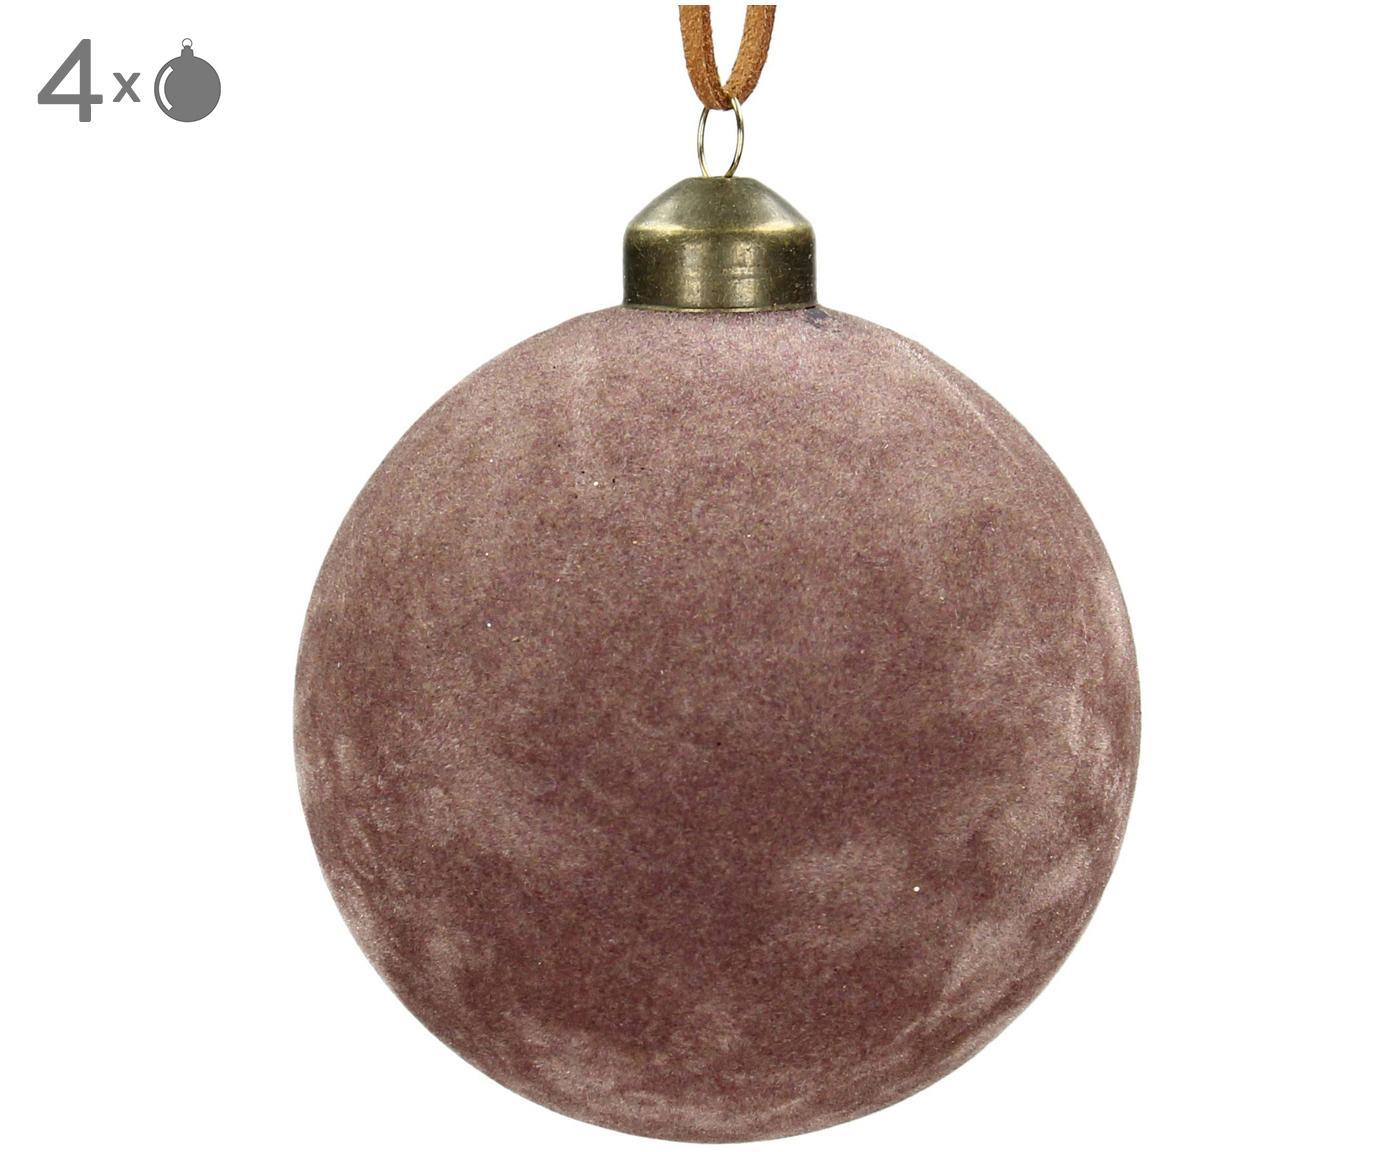 Bombka Velvet, 4 szt., Szkło, aksamit poliestrowy, Blady różowy, Ø 8 cm